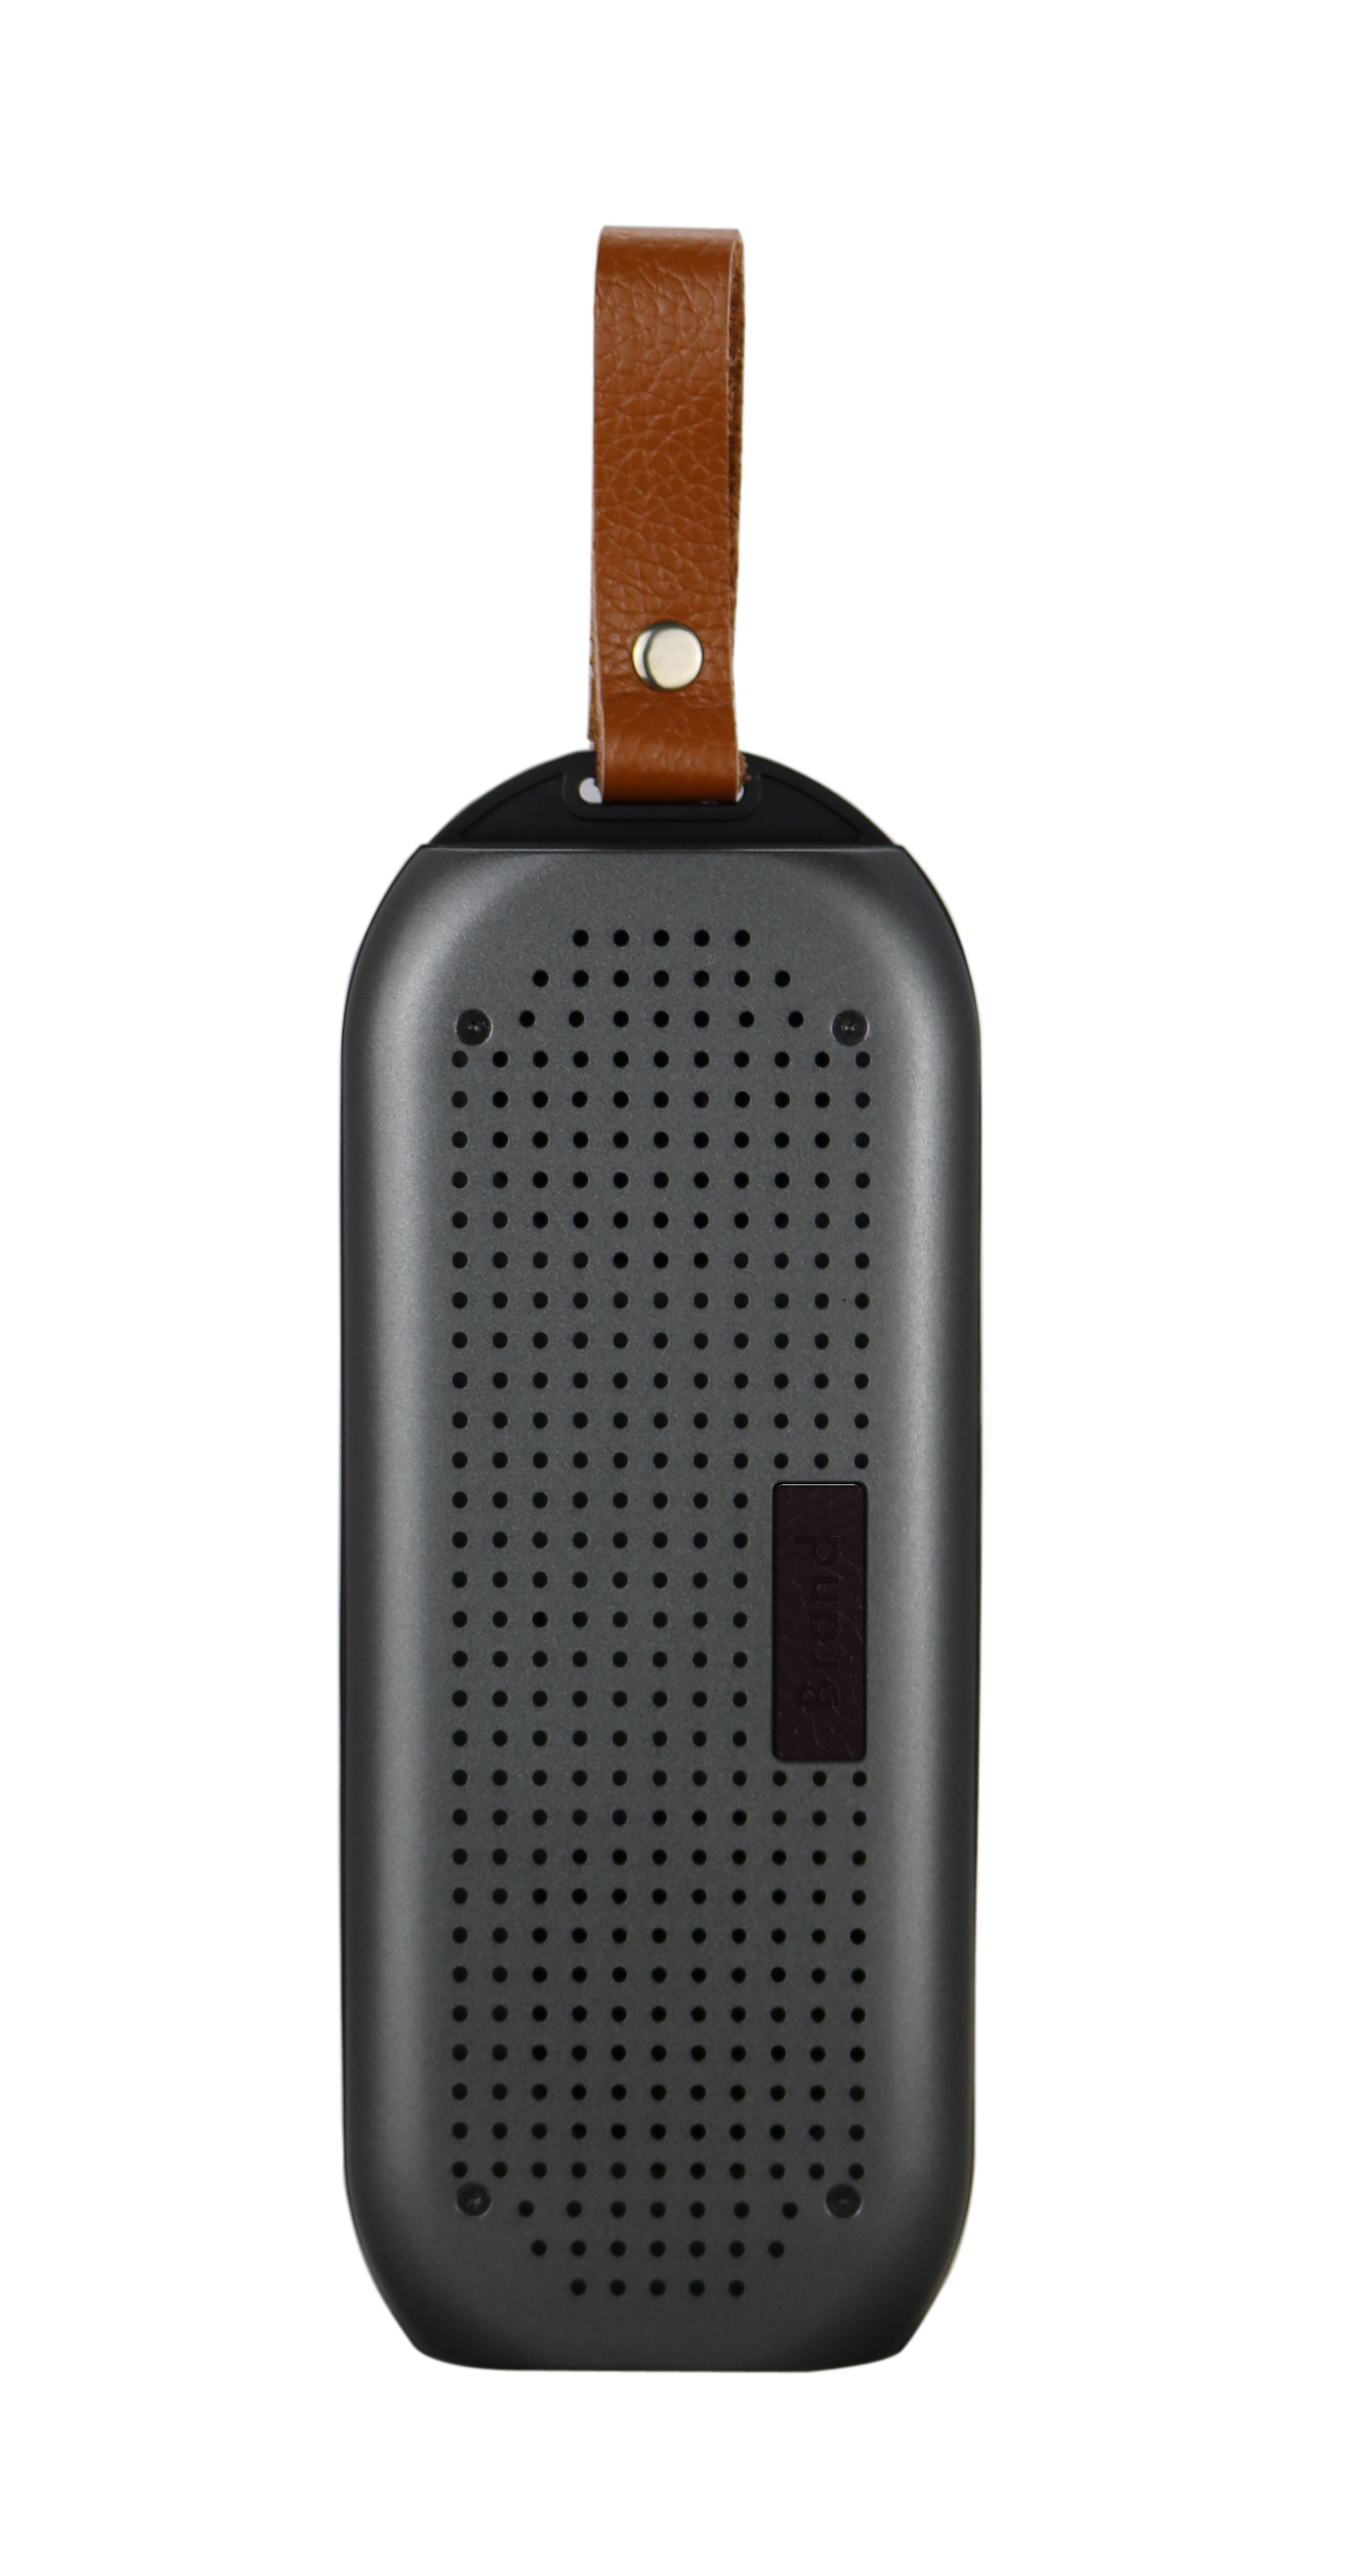 Outdoor Ultra Thin Bluetooth Speaker Dual 3W Speaker Waterproof Rating IPX7